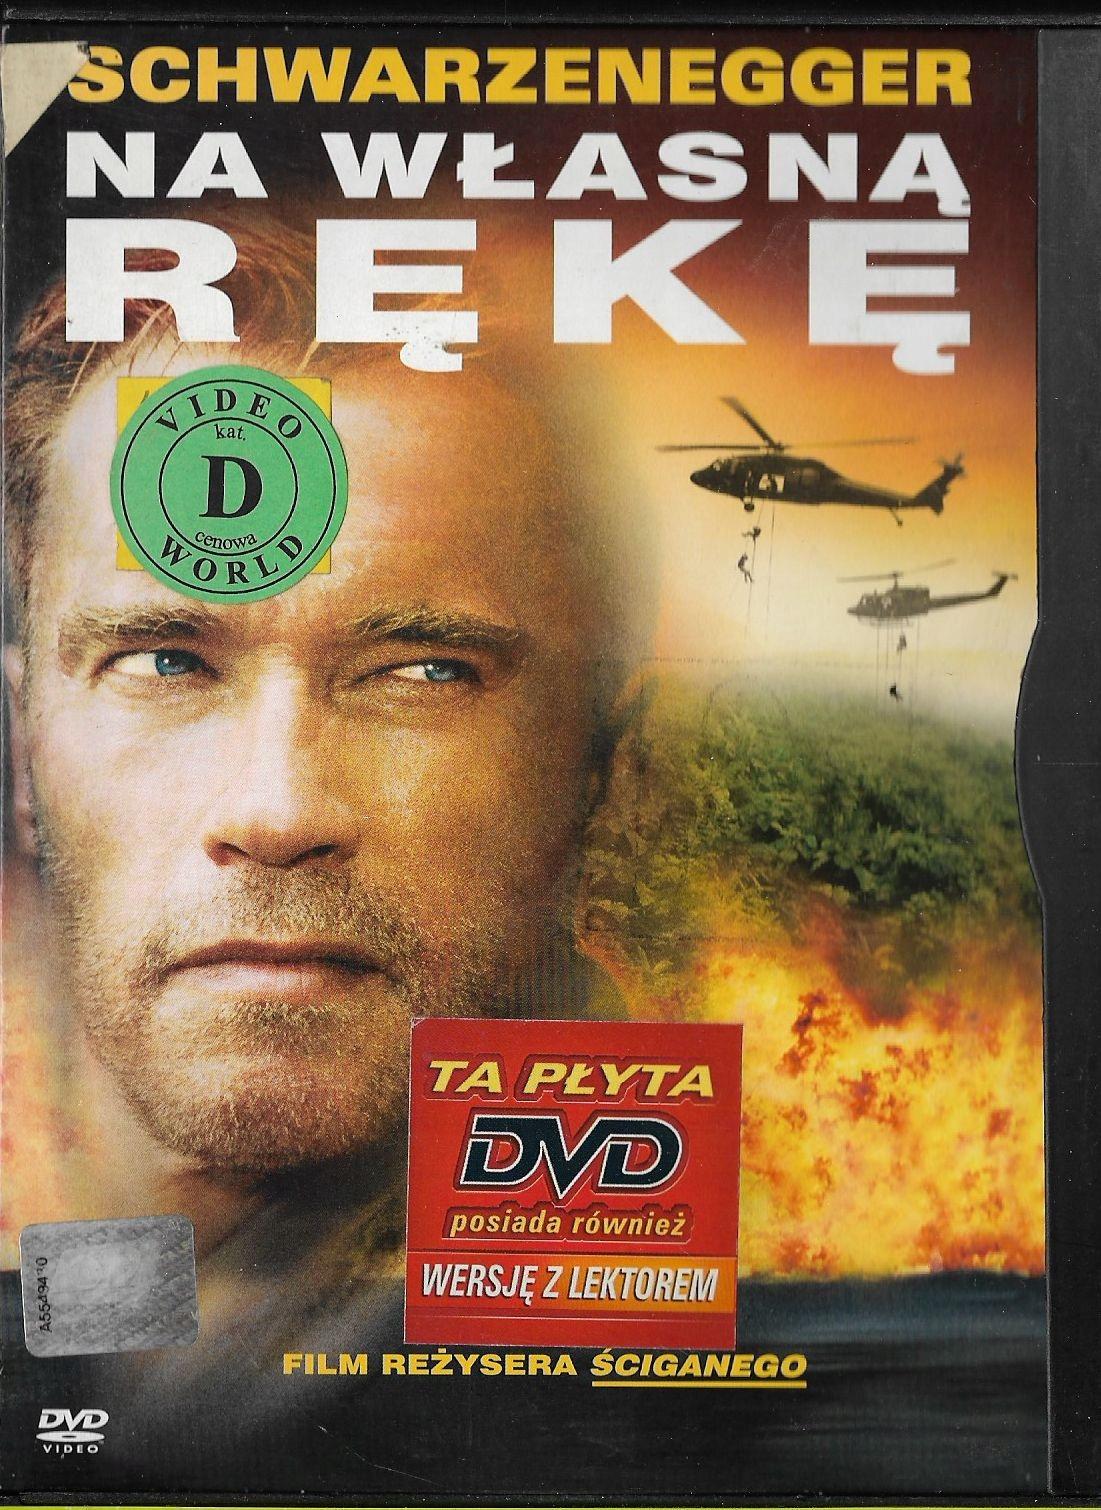 Na własną rękę / A.Schwarzenegger DVD lektor PL